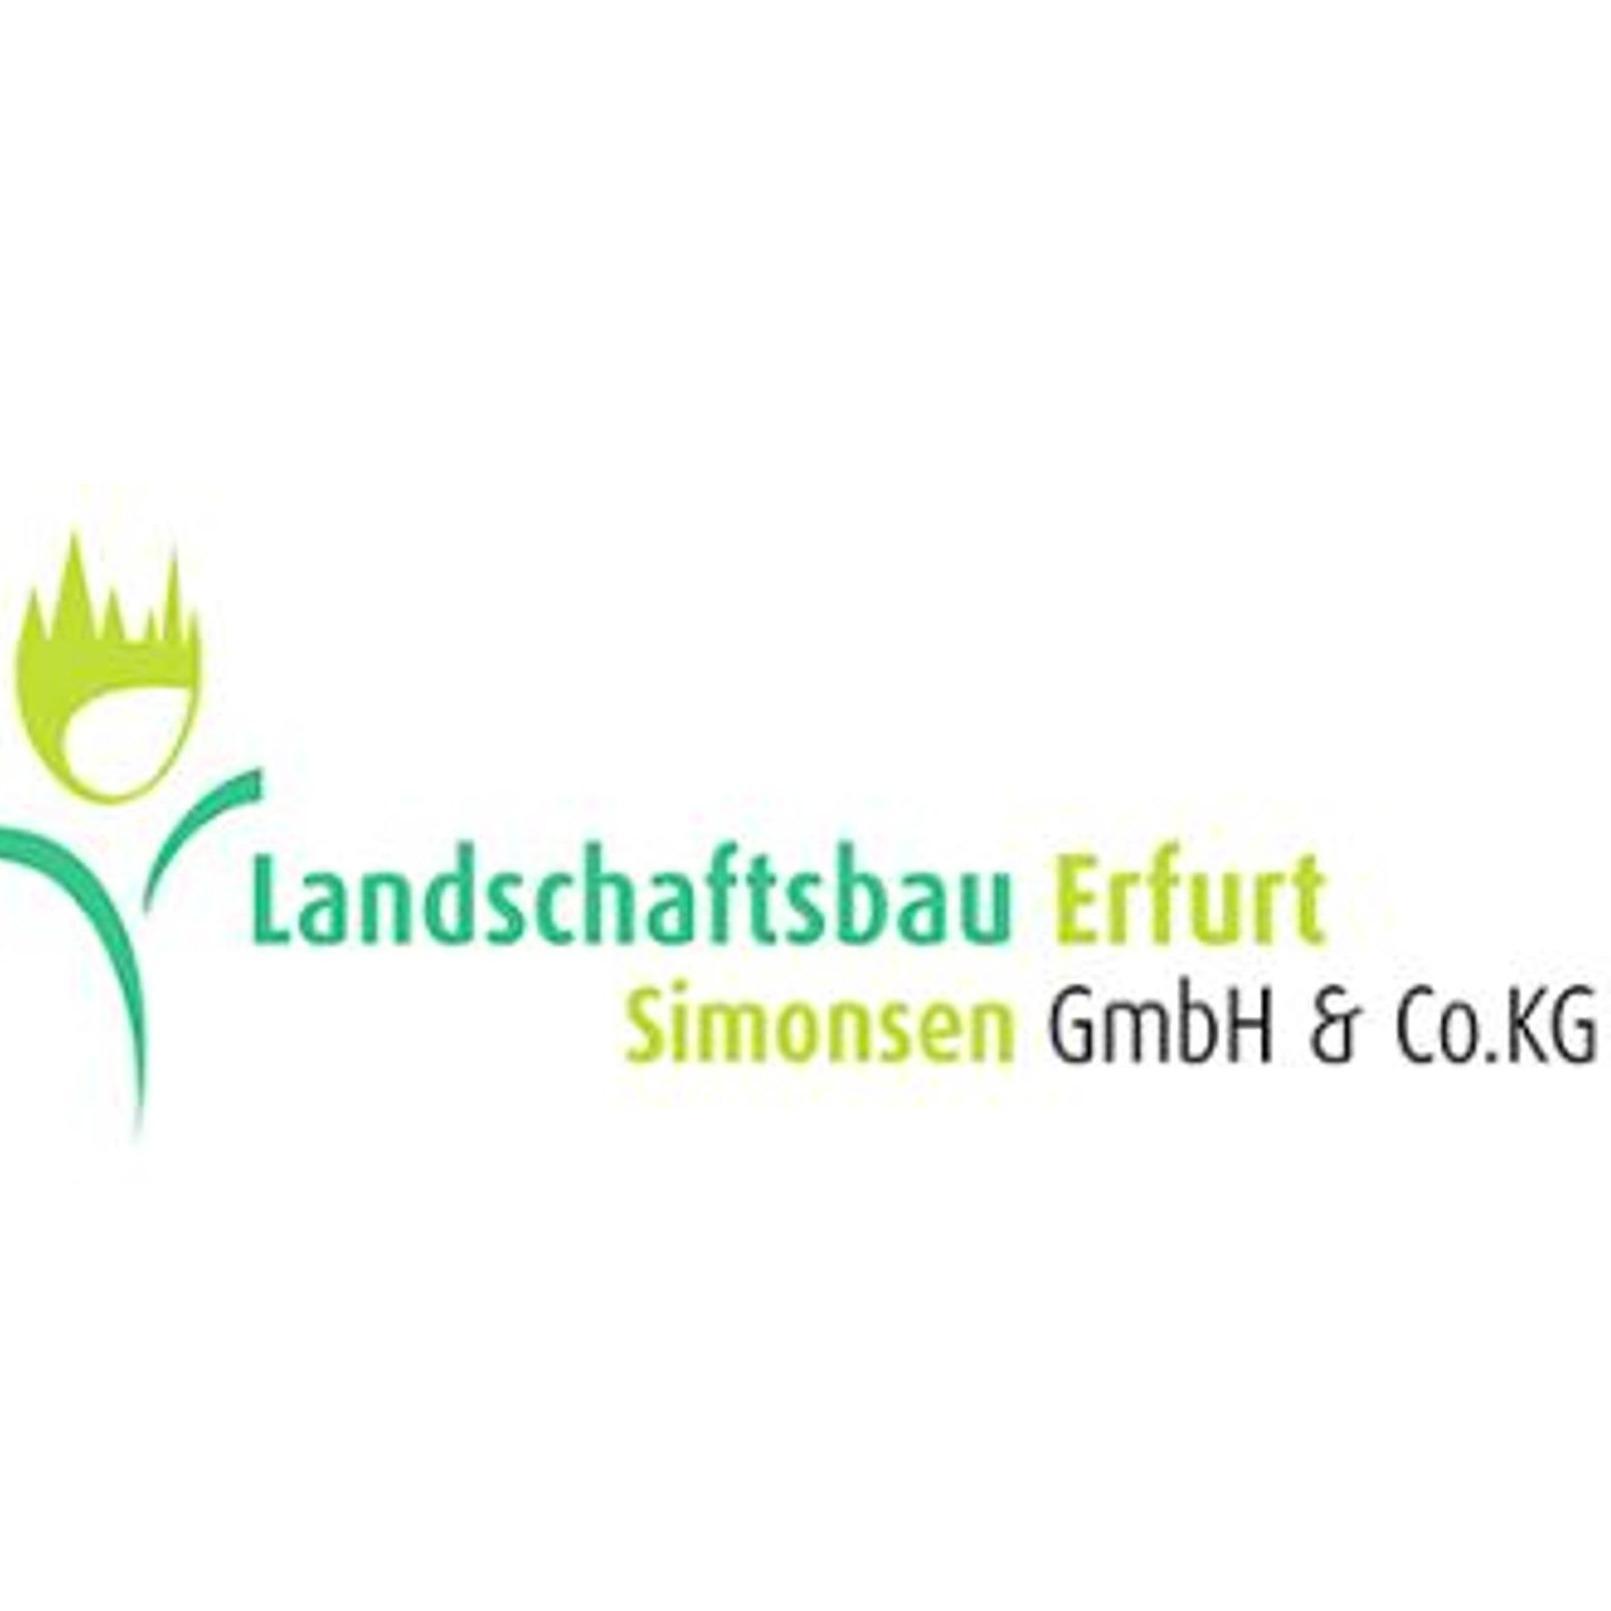 Landschaftsbau Erfurt Simonsen GmbH & Co. KG